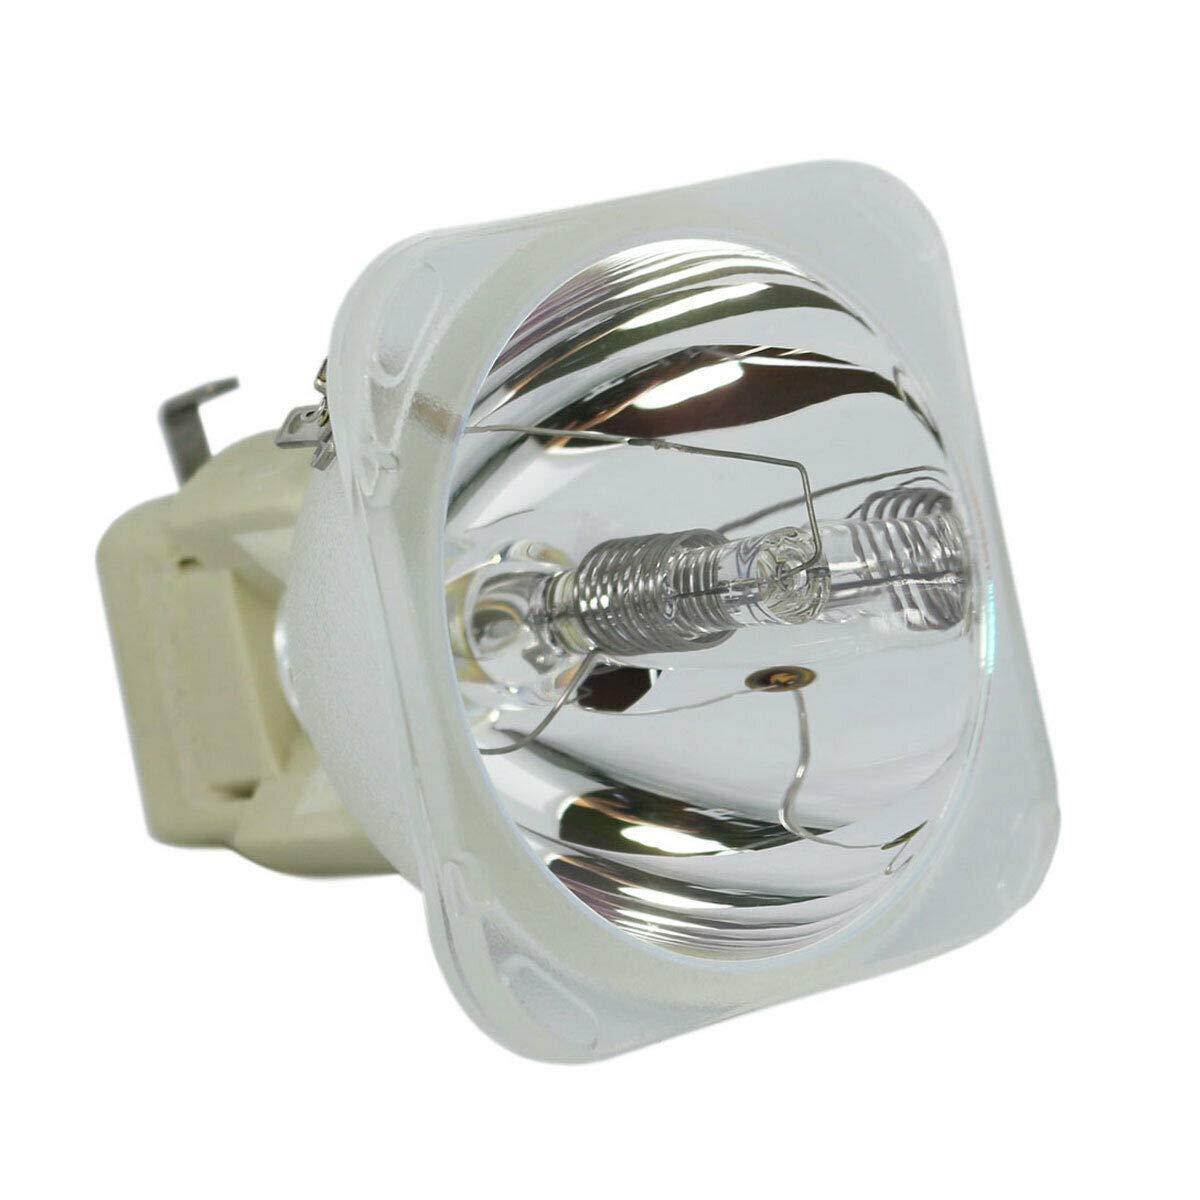 Supermait EC.K1400.001 プロジェクター交換用元裸電球 純正OEM 180日間安心保証つき 適用機種: S5200   B07PWL4SQV